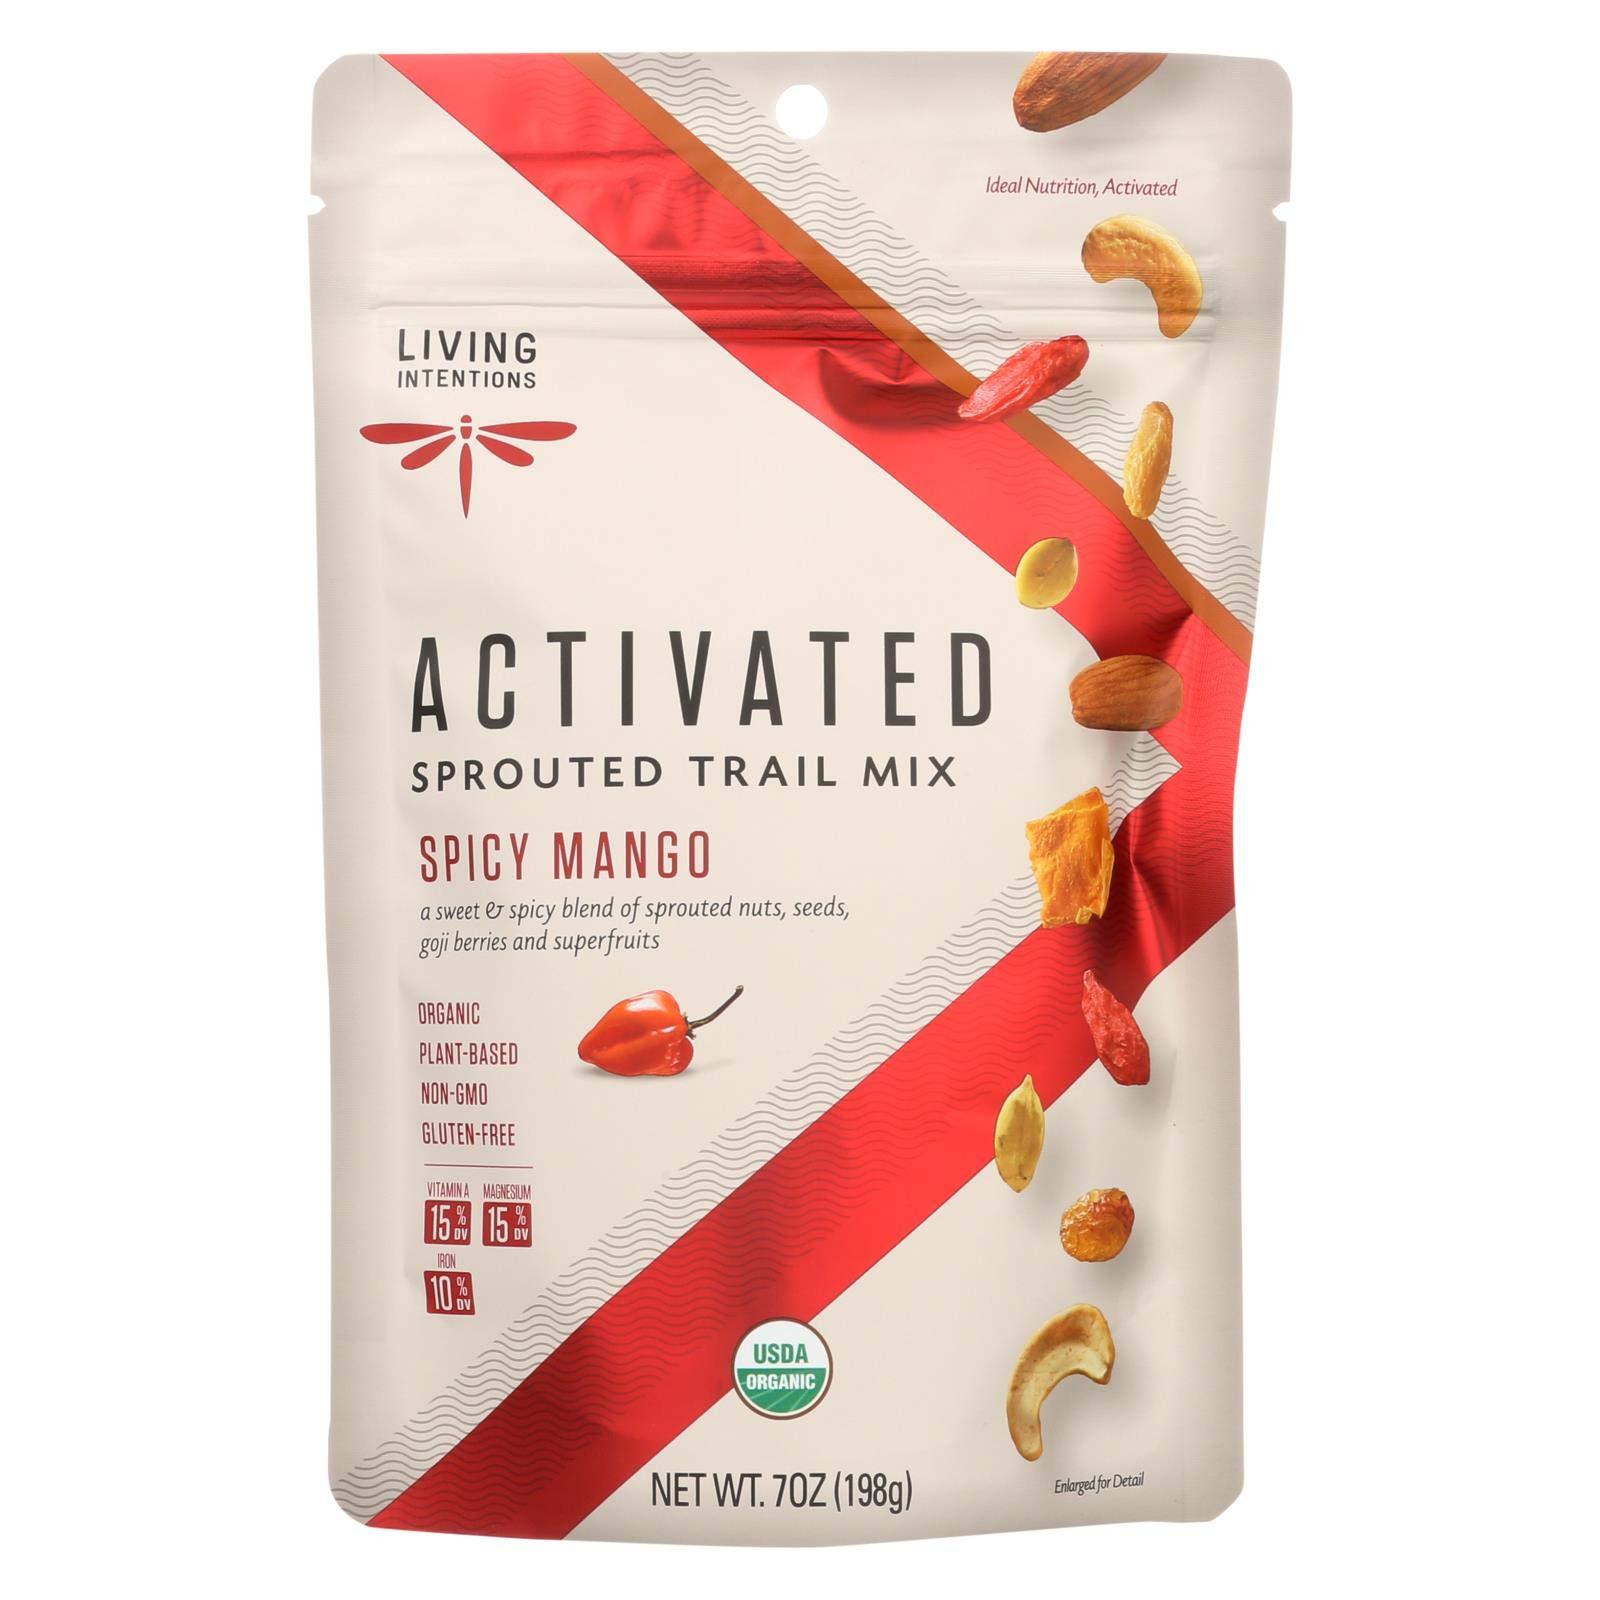 Living Intentions Trail Mix - Organic - Sprouted - Mango Goji Fire - 7 oz - case of 6 - 95%+ Organic - Gluten Free - Vegan